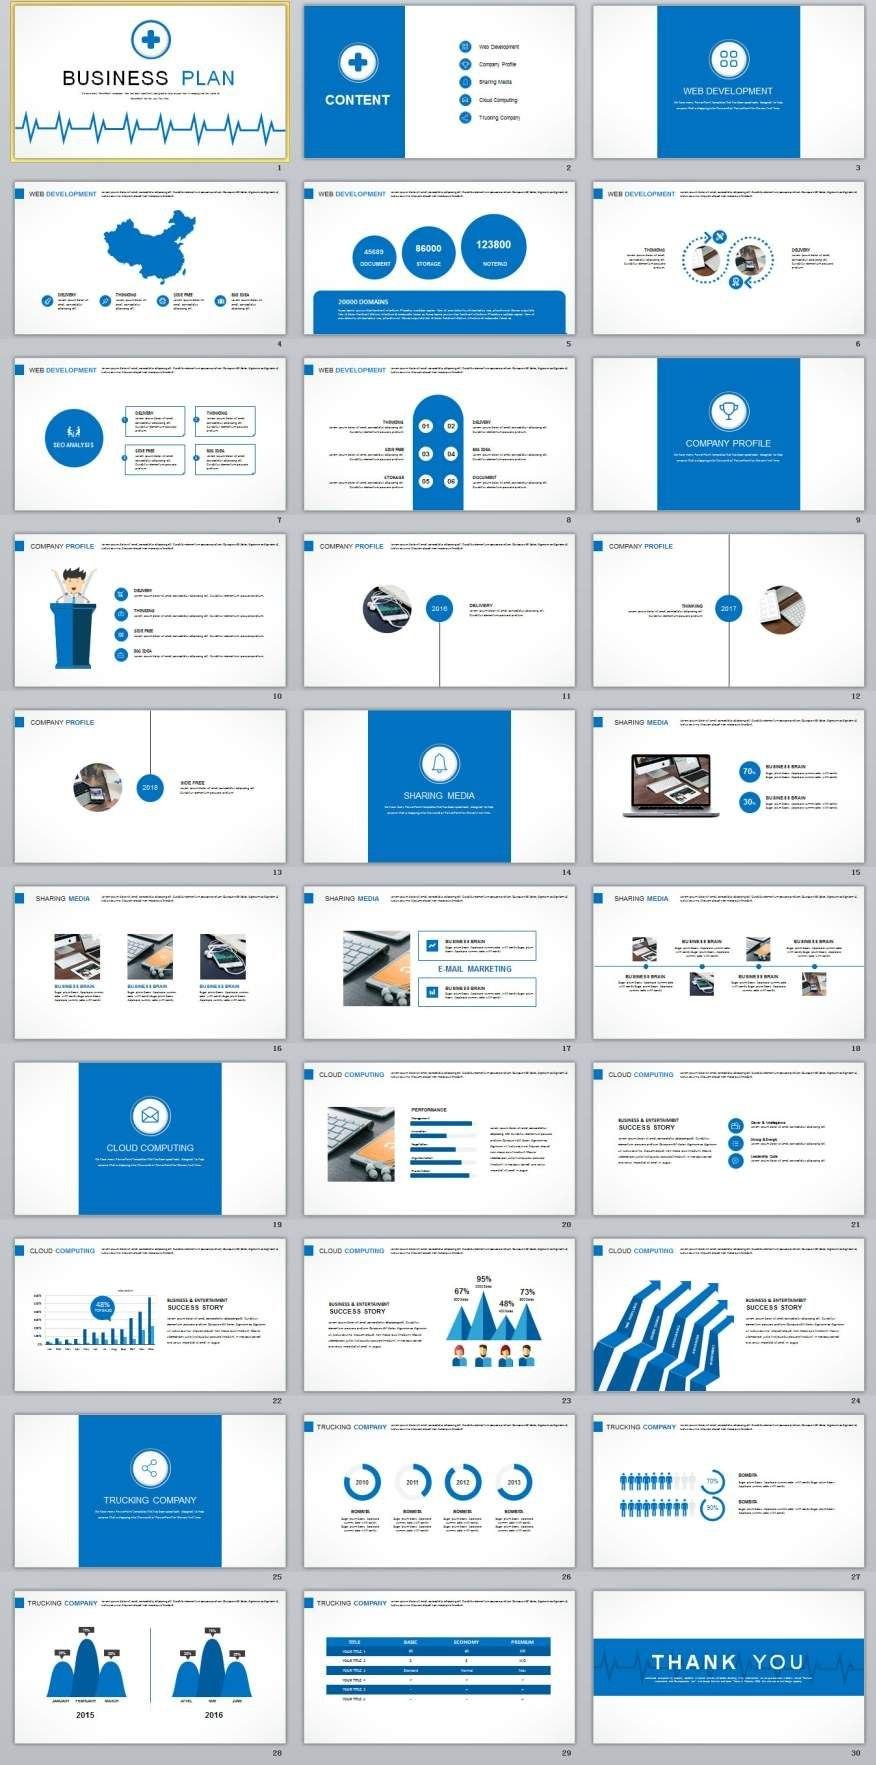 Best Business Plan Powerpoint Templates   Best Powerpoint For Ppt Presentation Templates For Business